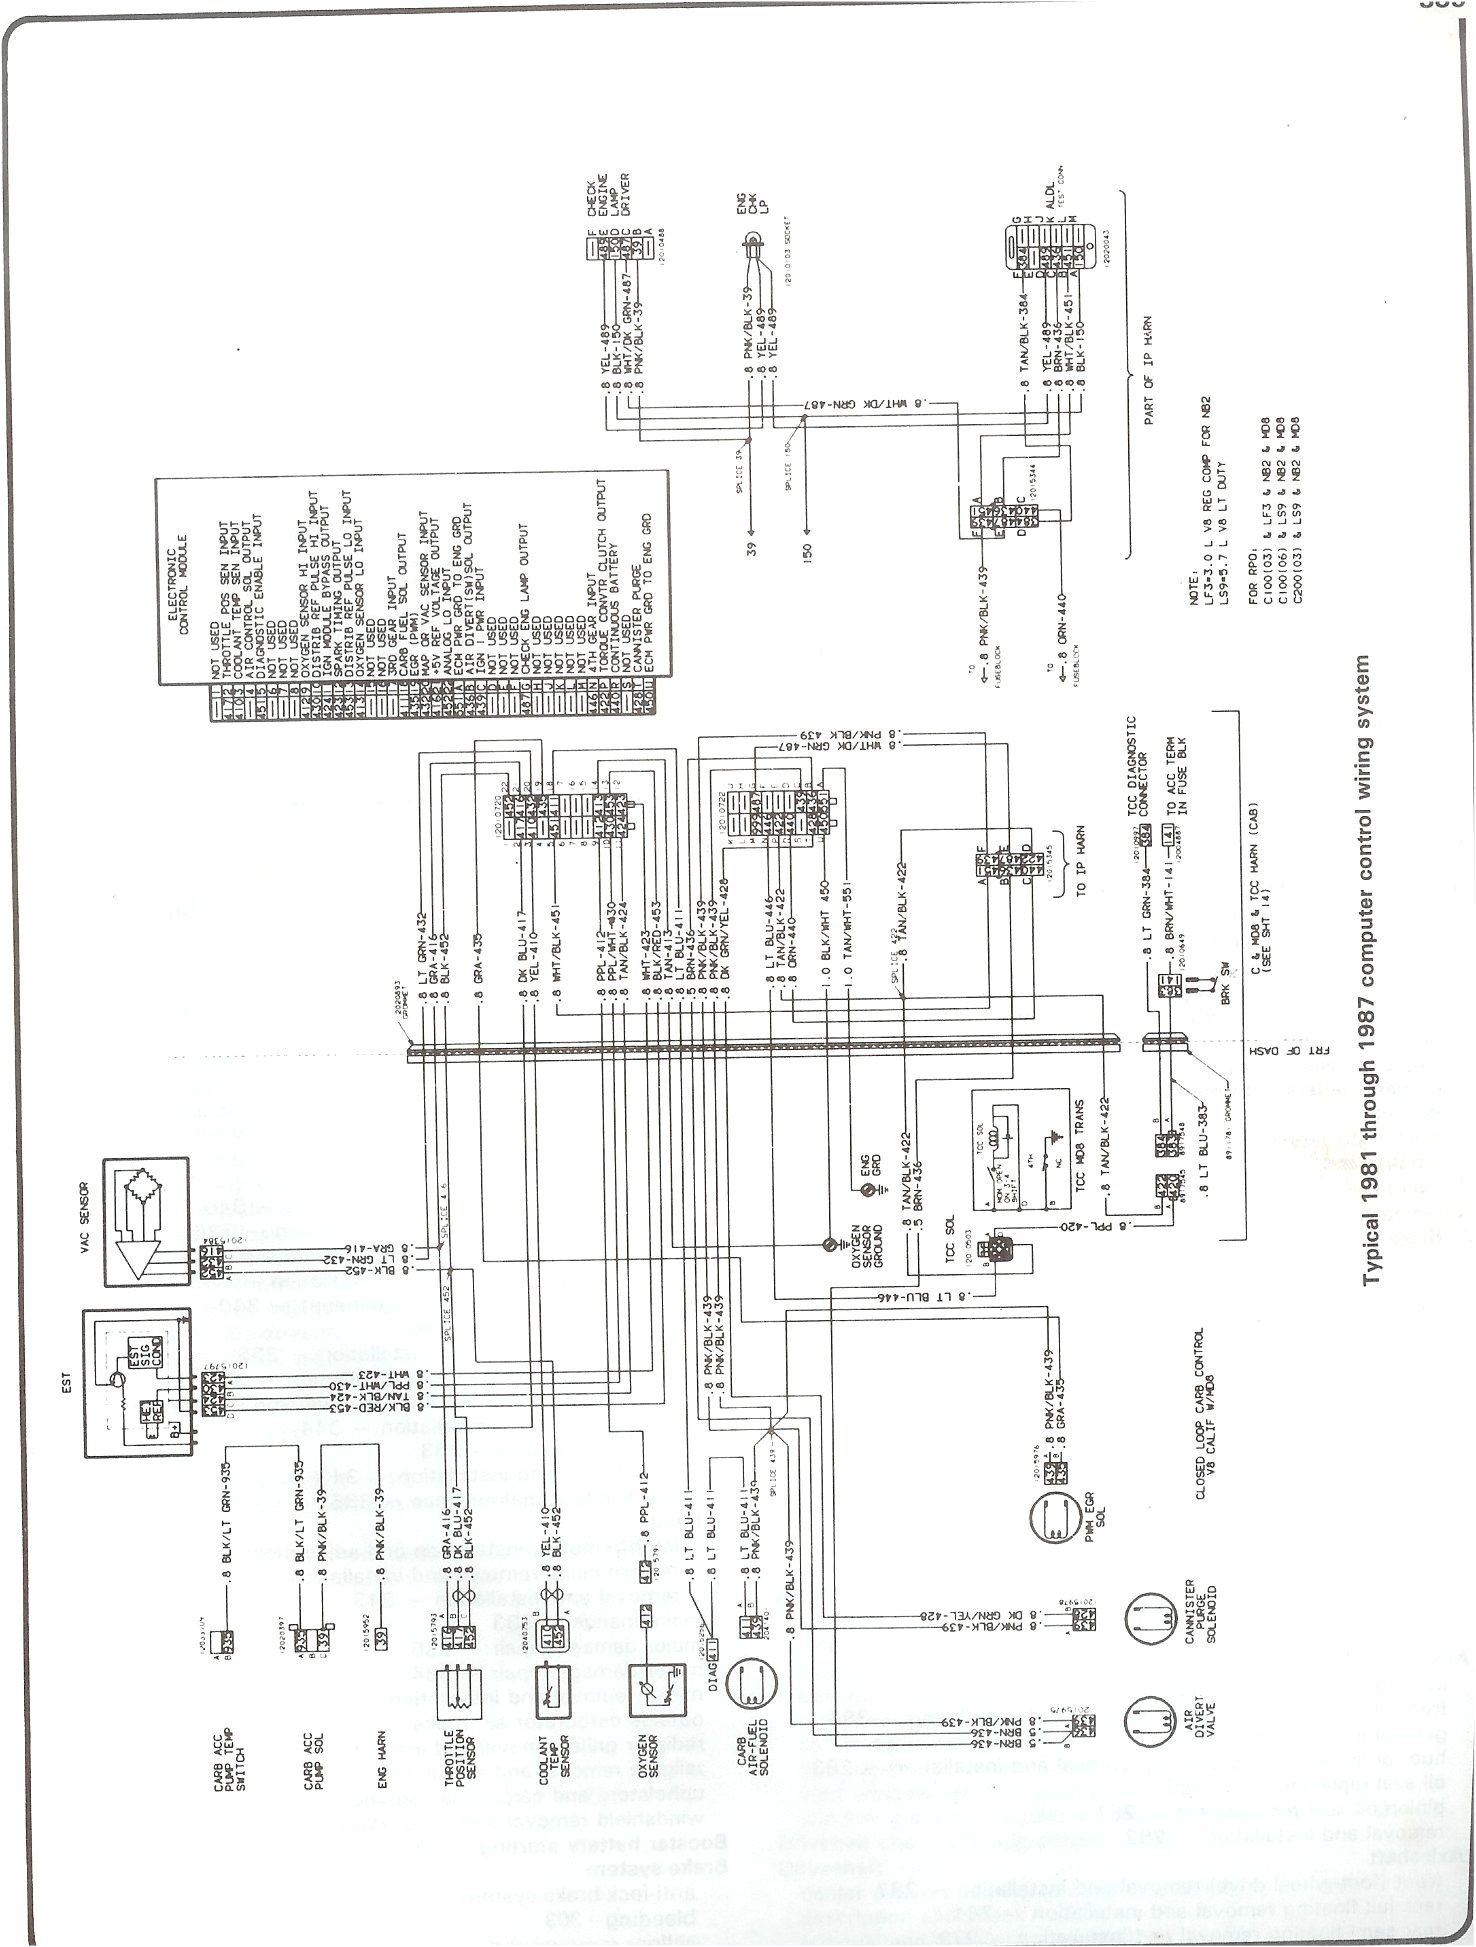 1979 chevrolet engine harness diagram wiring diagram 1979 chevy c10 wiring diagram